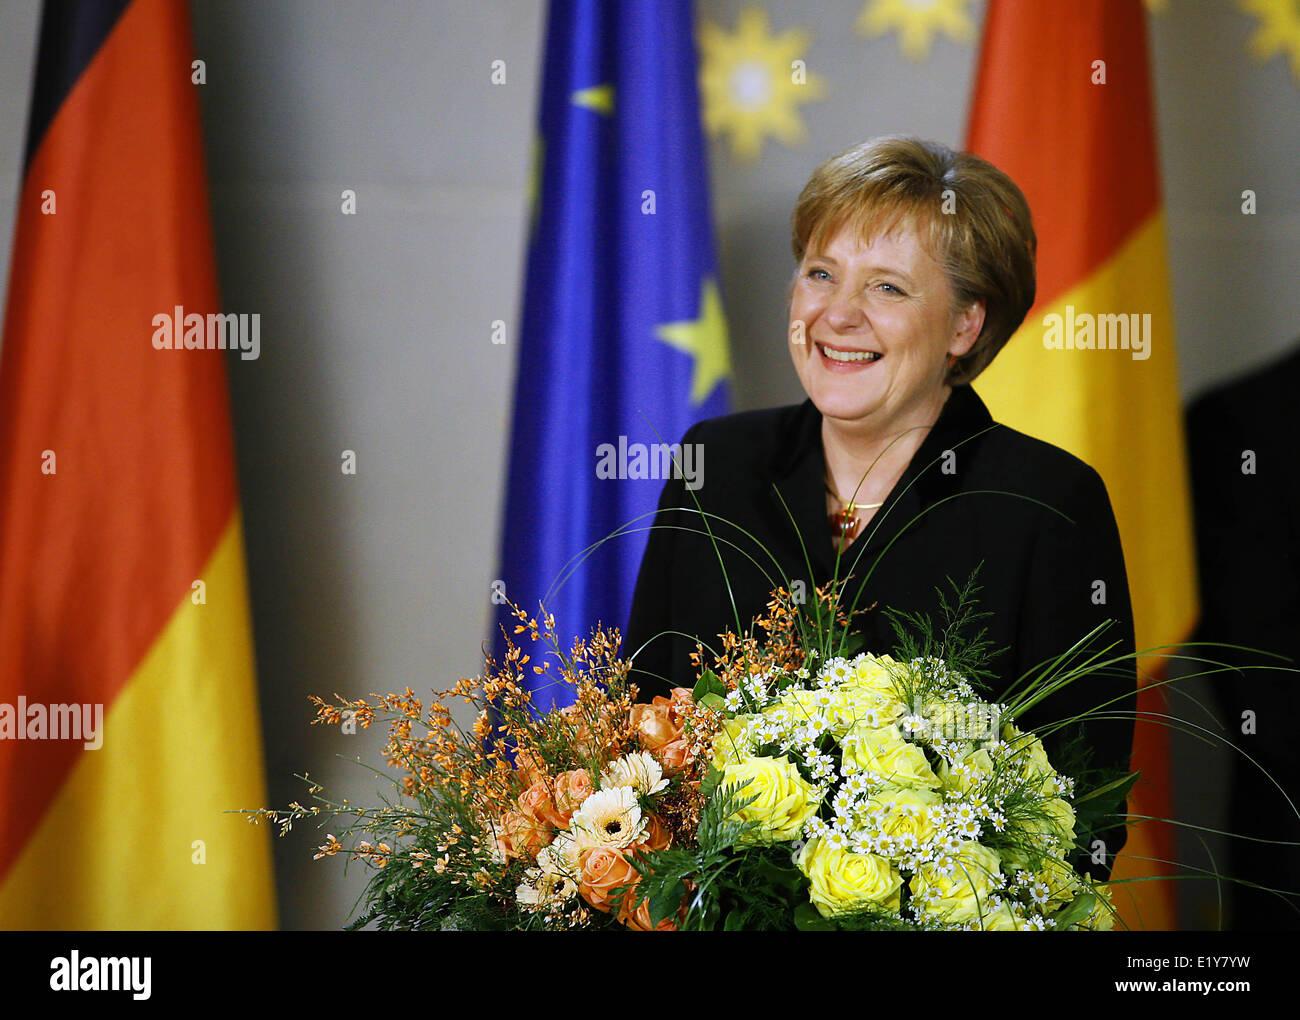 Chancellor Angela Merkel smiles after previous chancellor Schröder has handed over the Federal Chancellor's - Stock Image